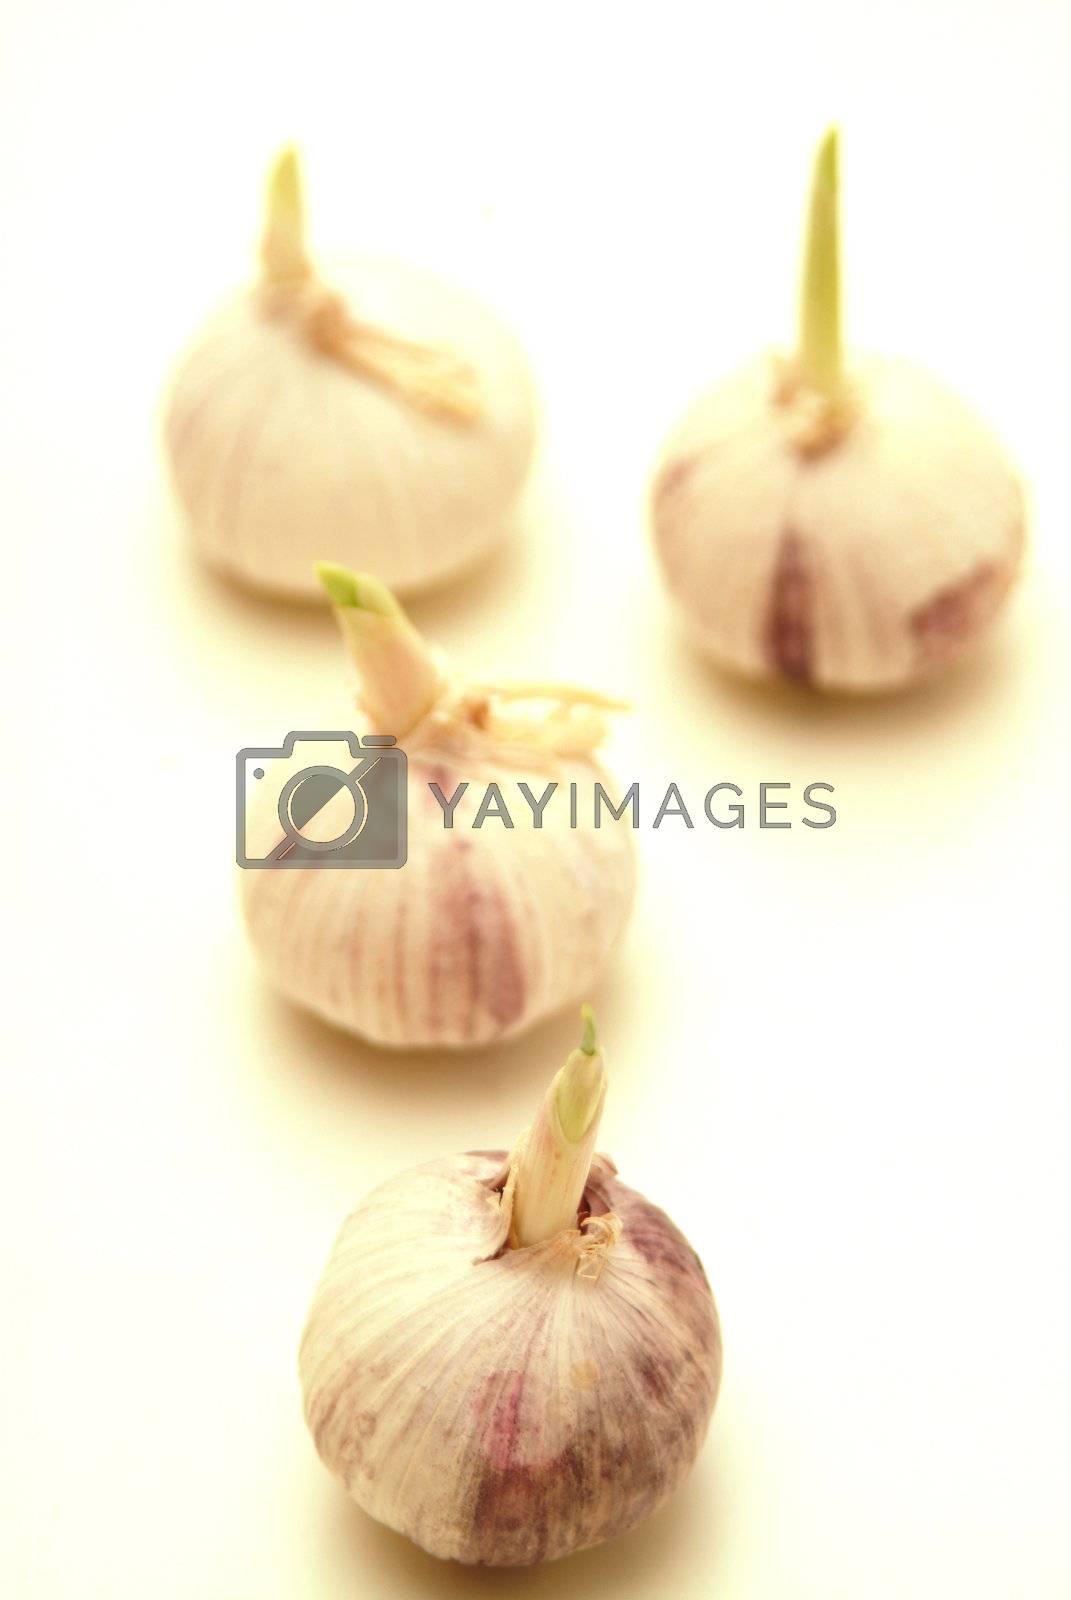 some garlic on a bright background  by Szakaly